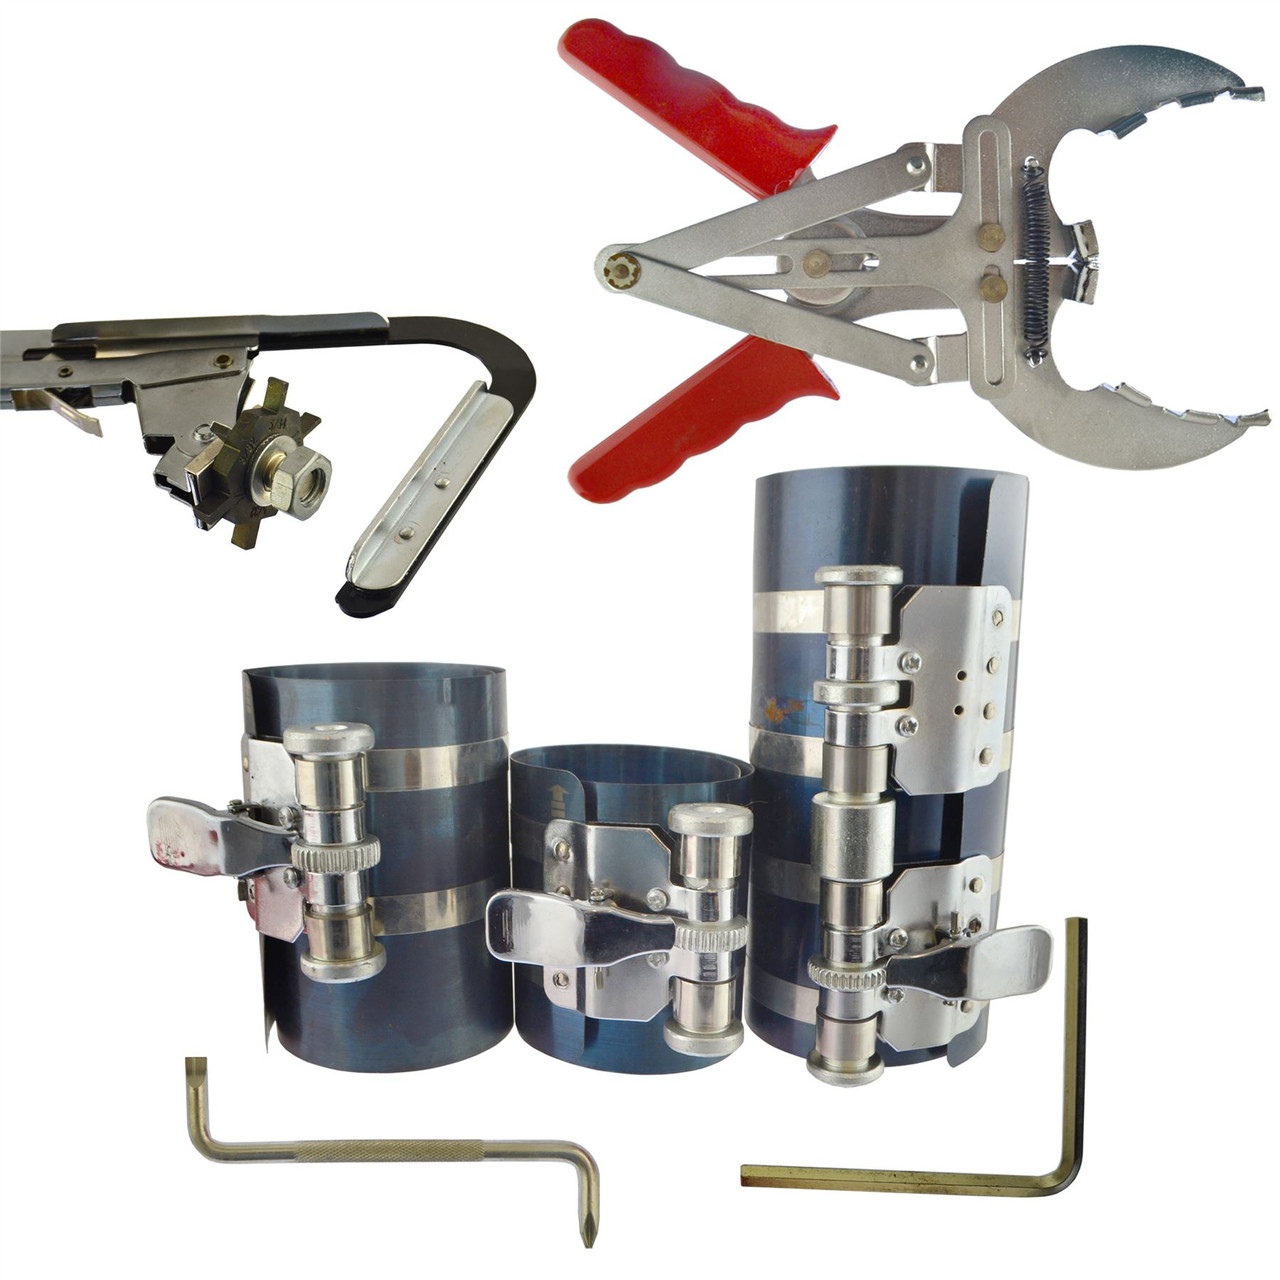 85mm 2//4 Stroke LSR 43 Motorcycle Bike Piston Ring Compressor Tool Set 40mm